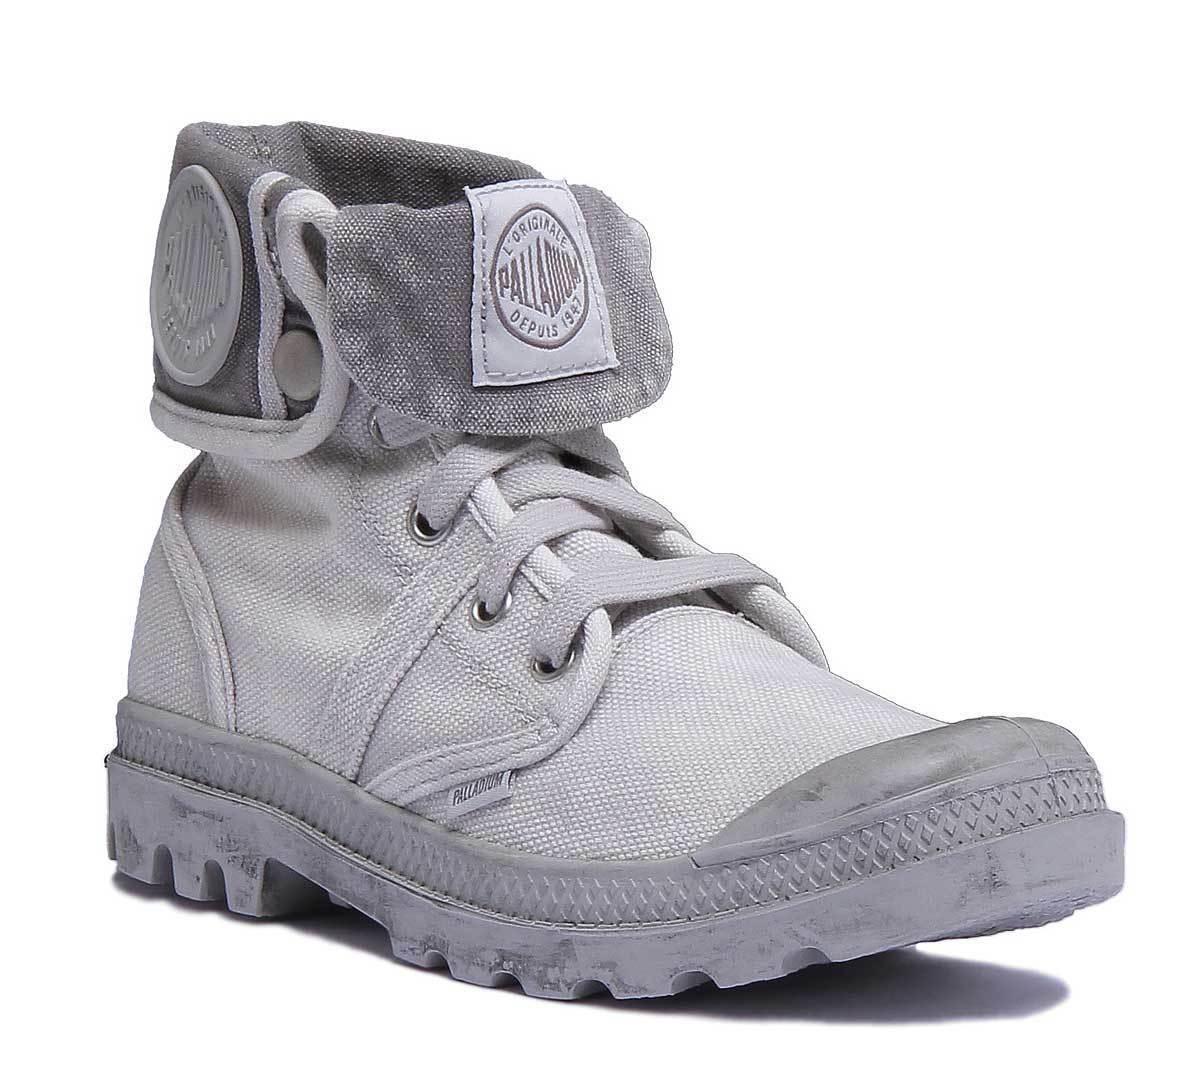 Palladium Pallabrouse Bag Womens Grey Canvas Boots Size Size Size UK 3 - 8 2d0043